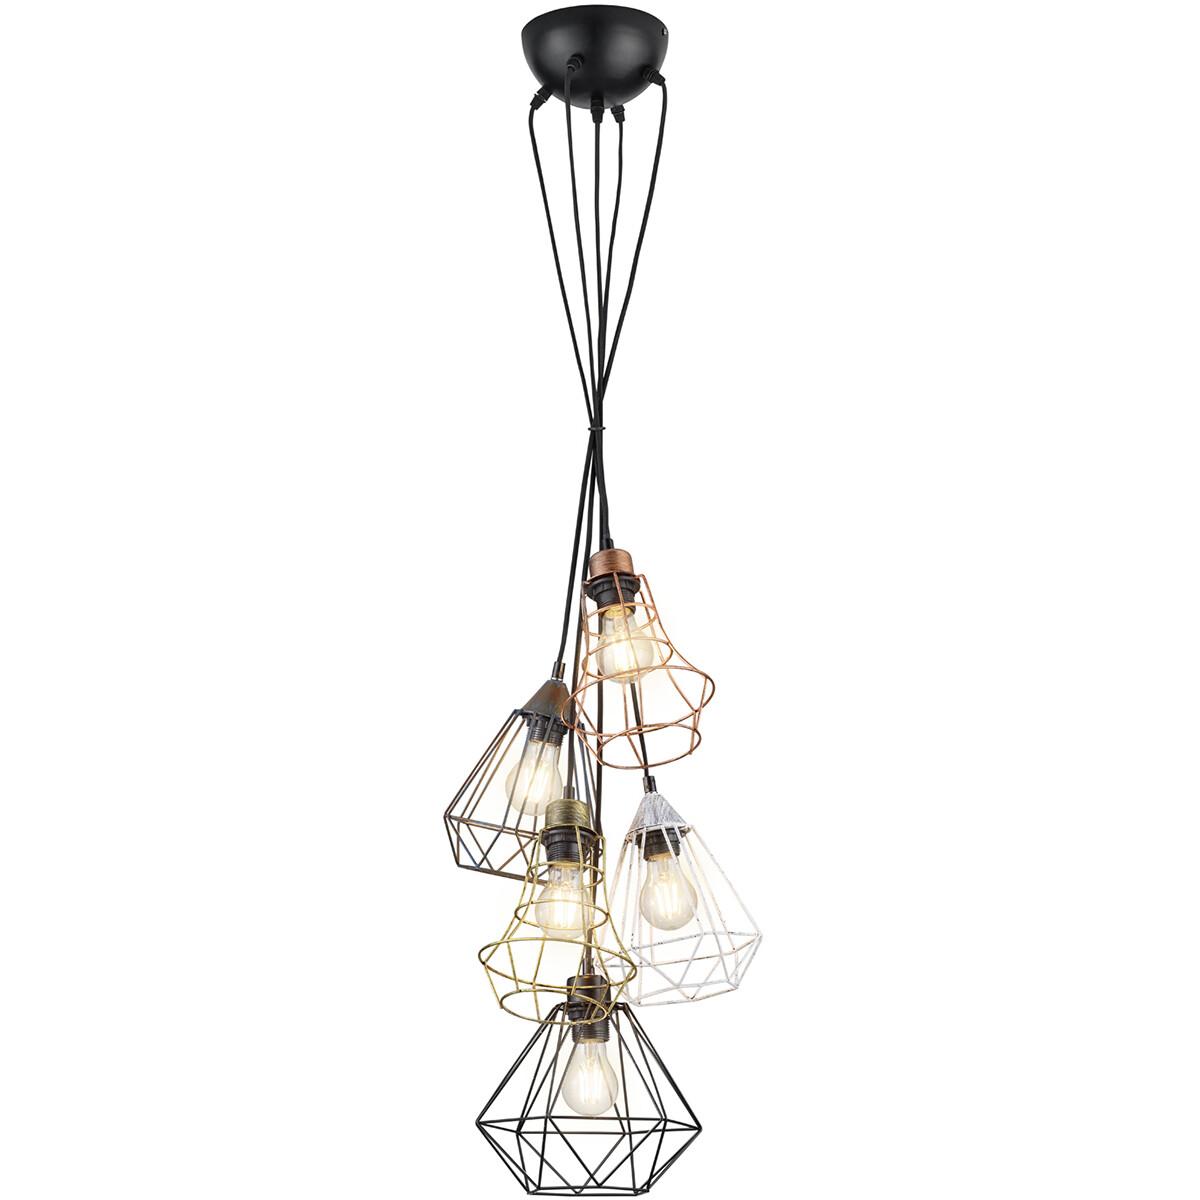 LED Hanglamp - Hangverlichting - Trion Meke - E27 Fitting - Rond - Meerkleurig - Aluminium